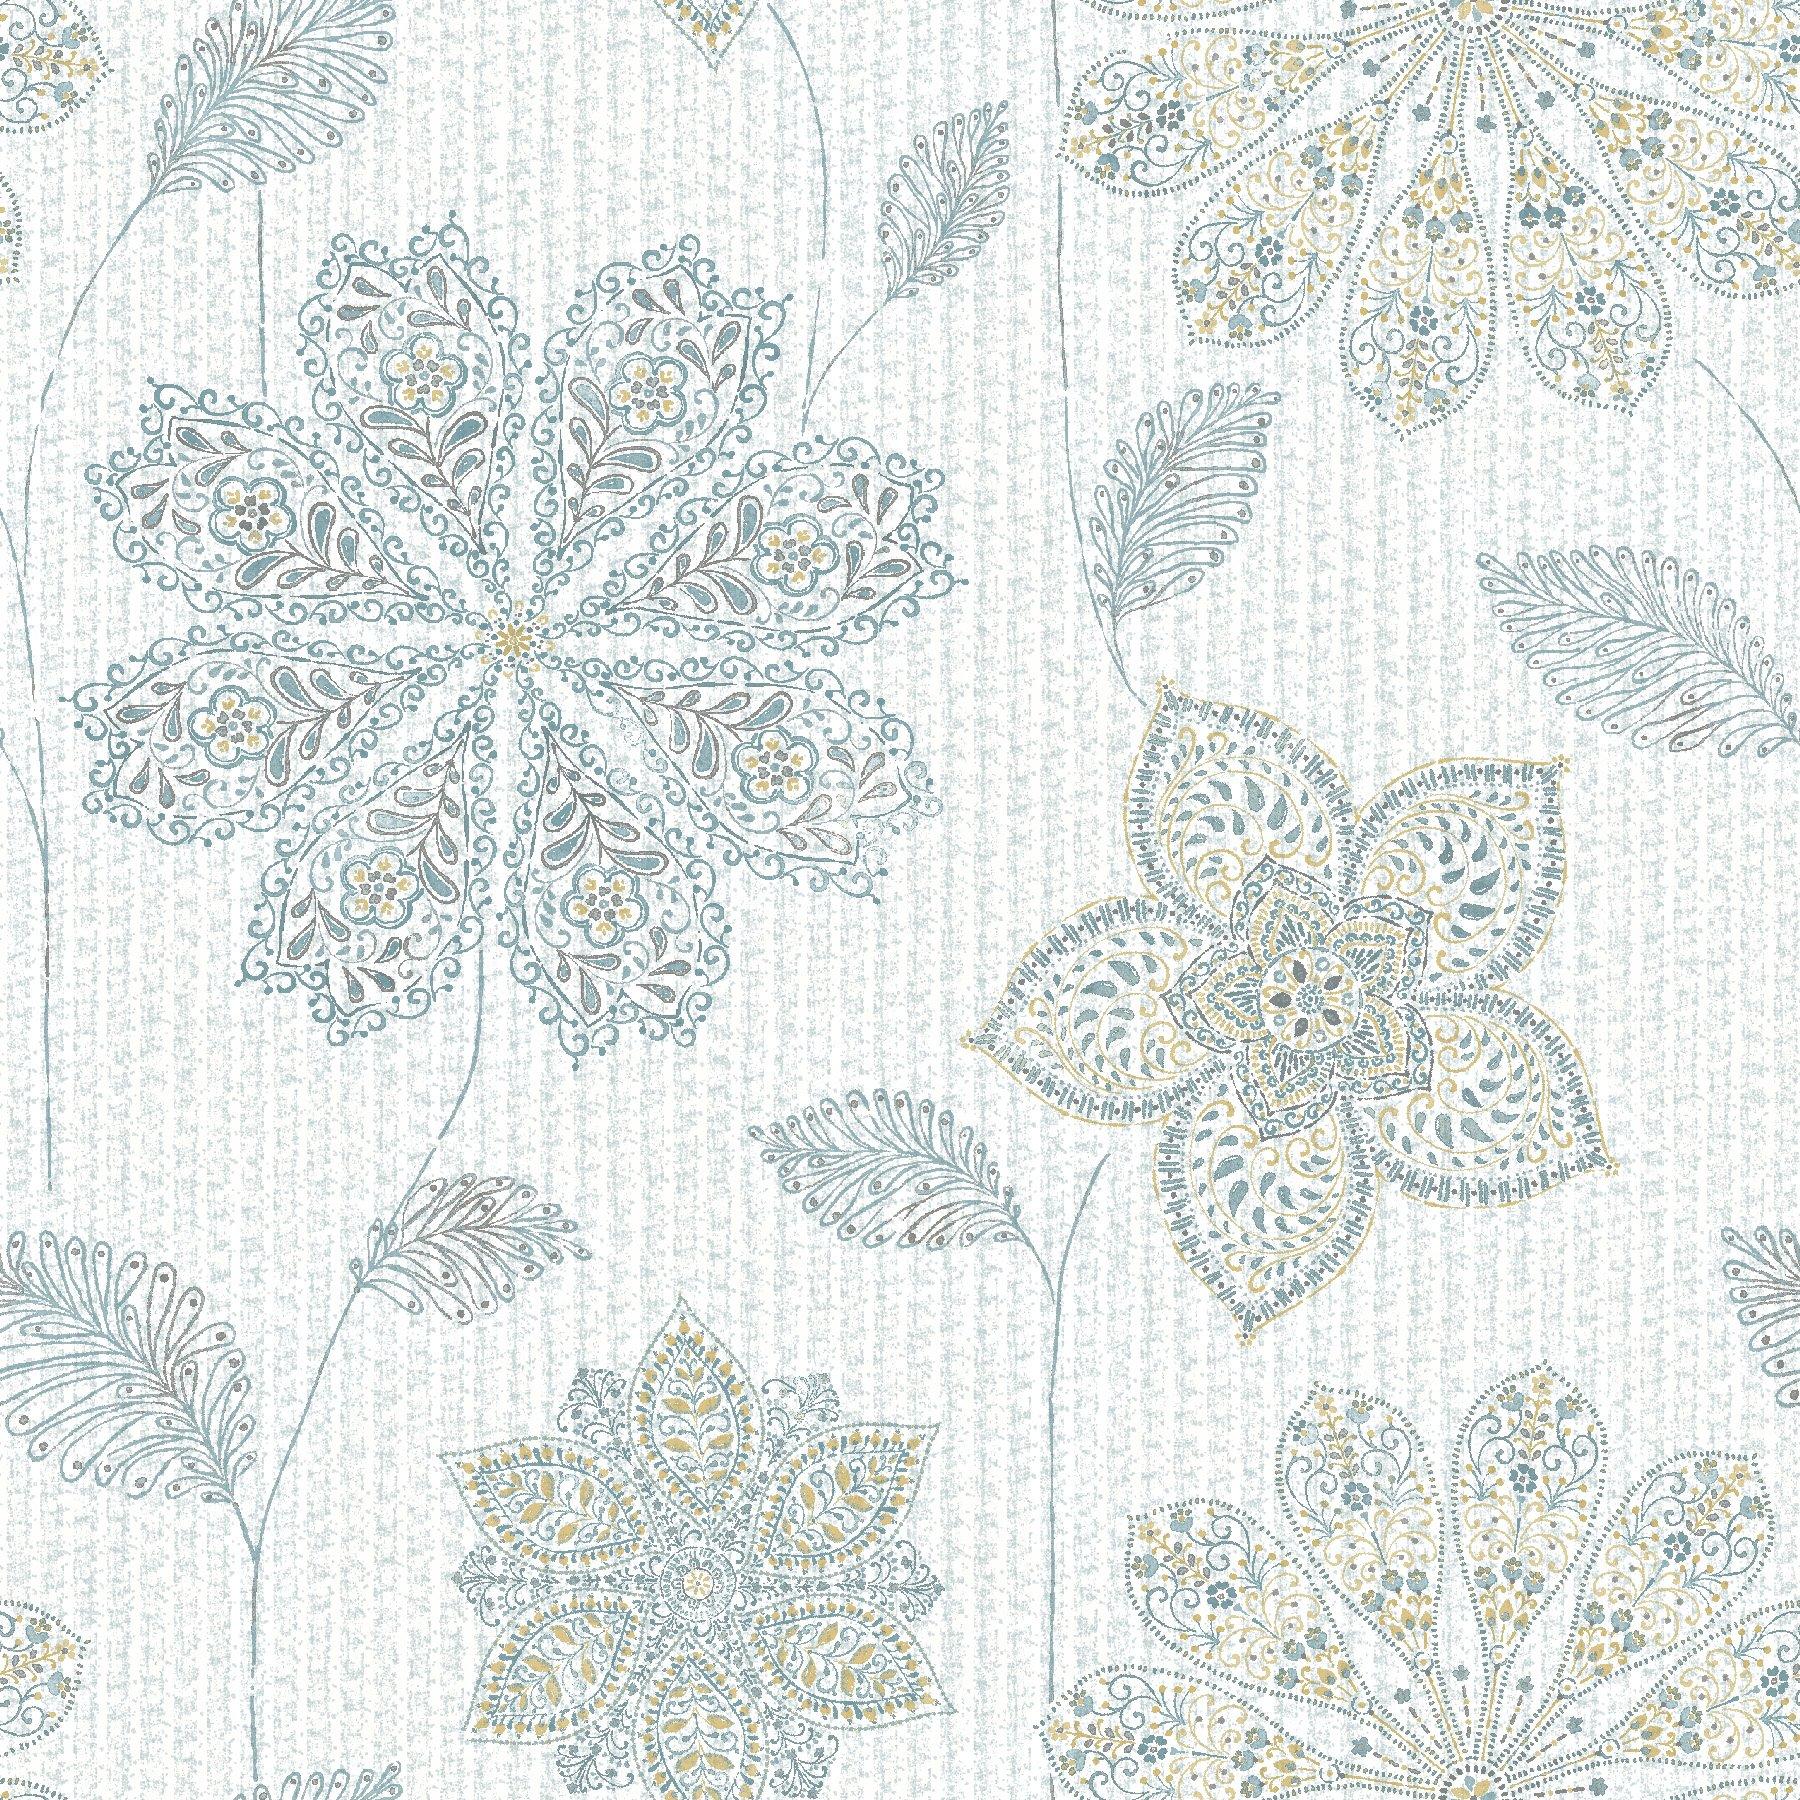 NuWallpaper NU1697 Gypsy Floral Blue/Green Peel & Stick Wallpaper